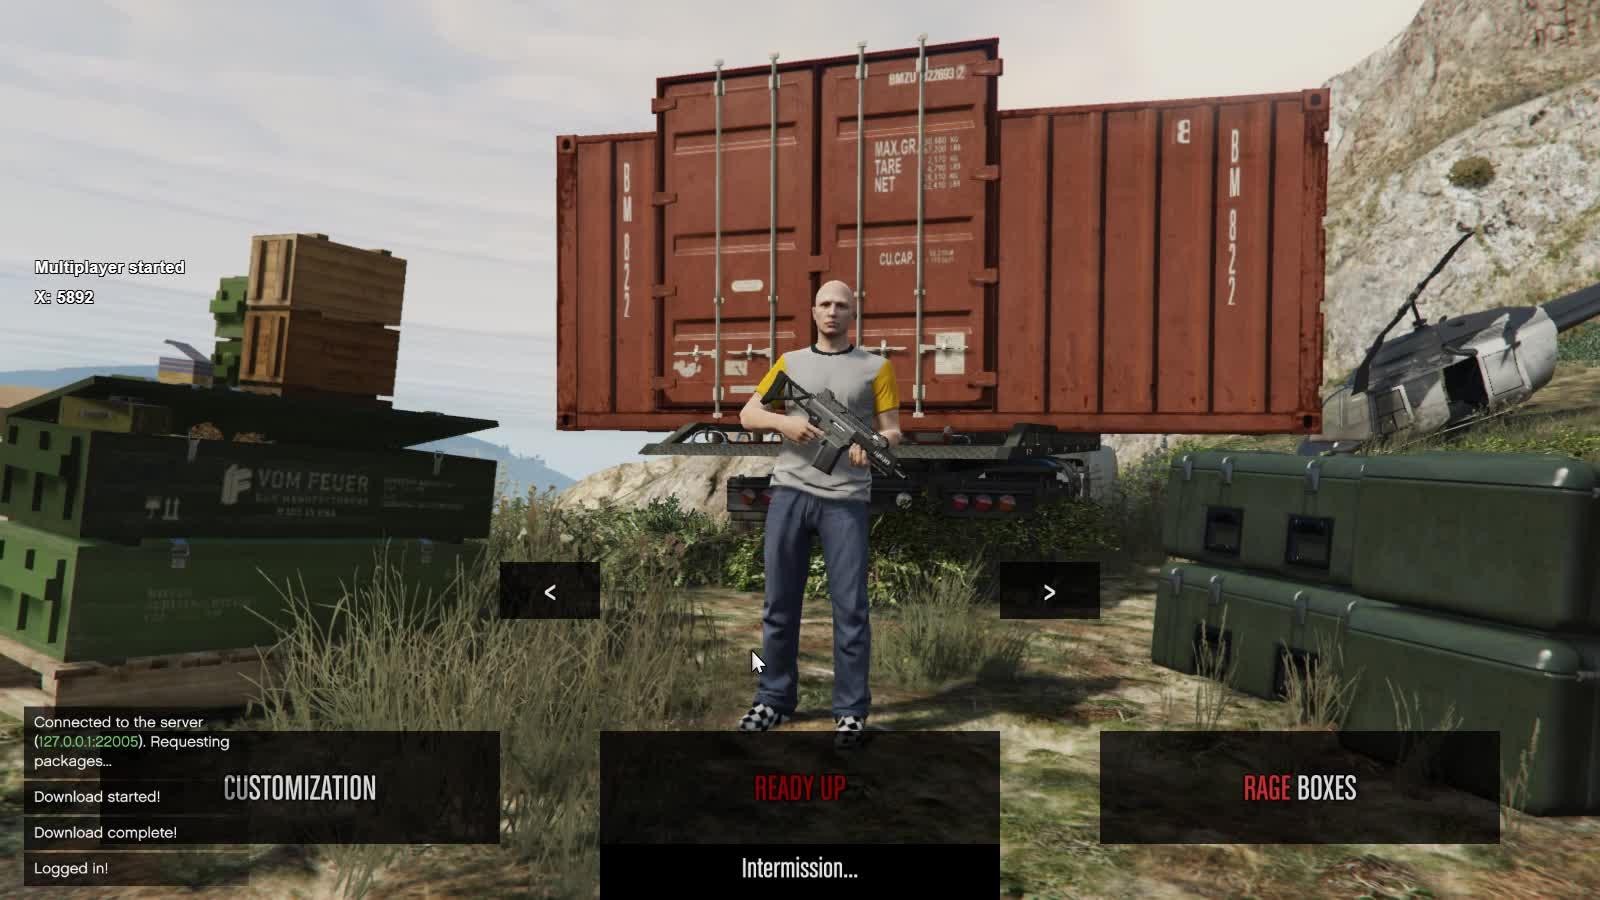 grandtheftautov, Grand Theft Auto V 2018.08.06 - 13.49.57.04 GIFs